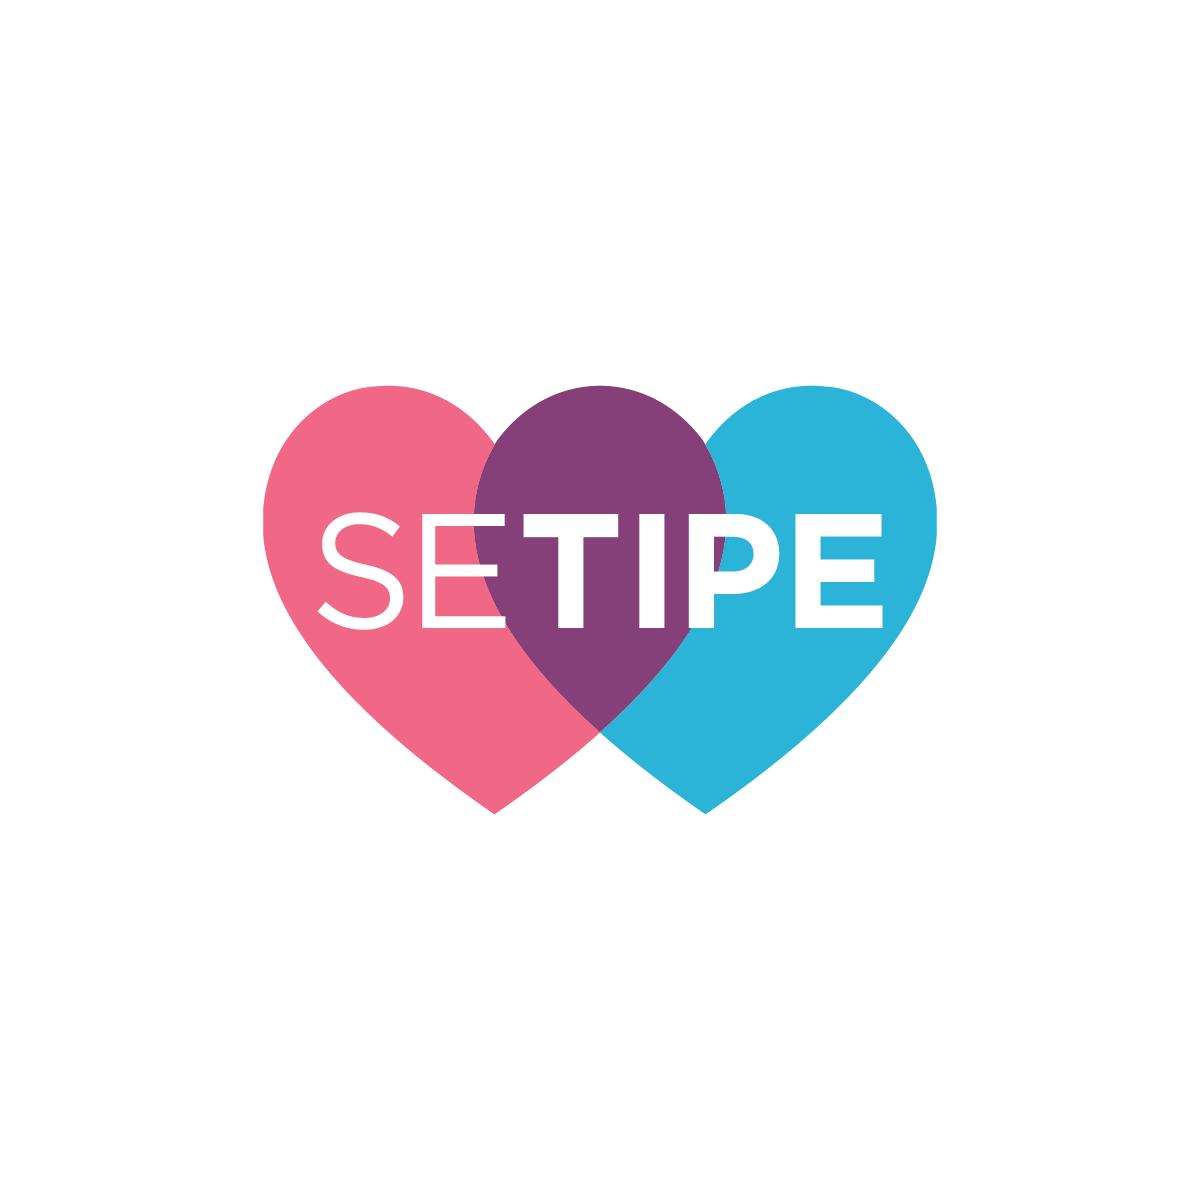 Setipe